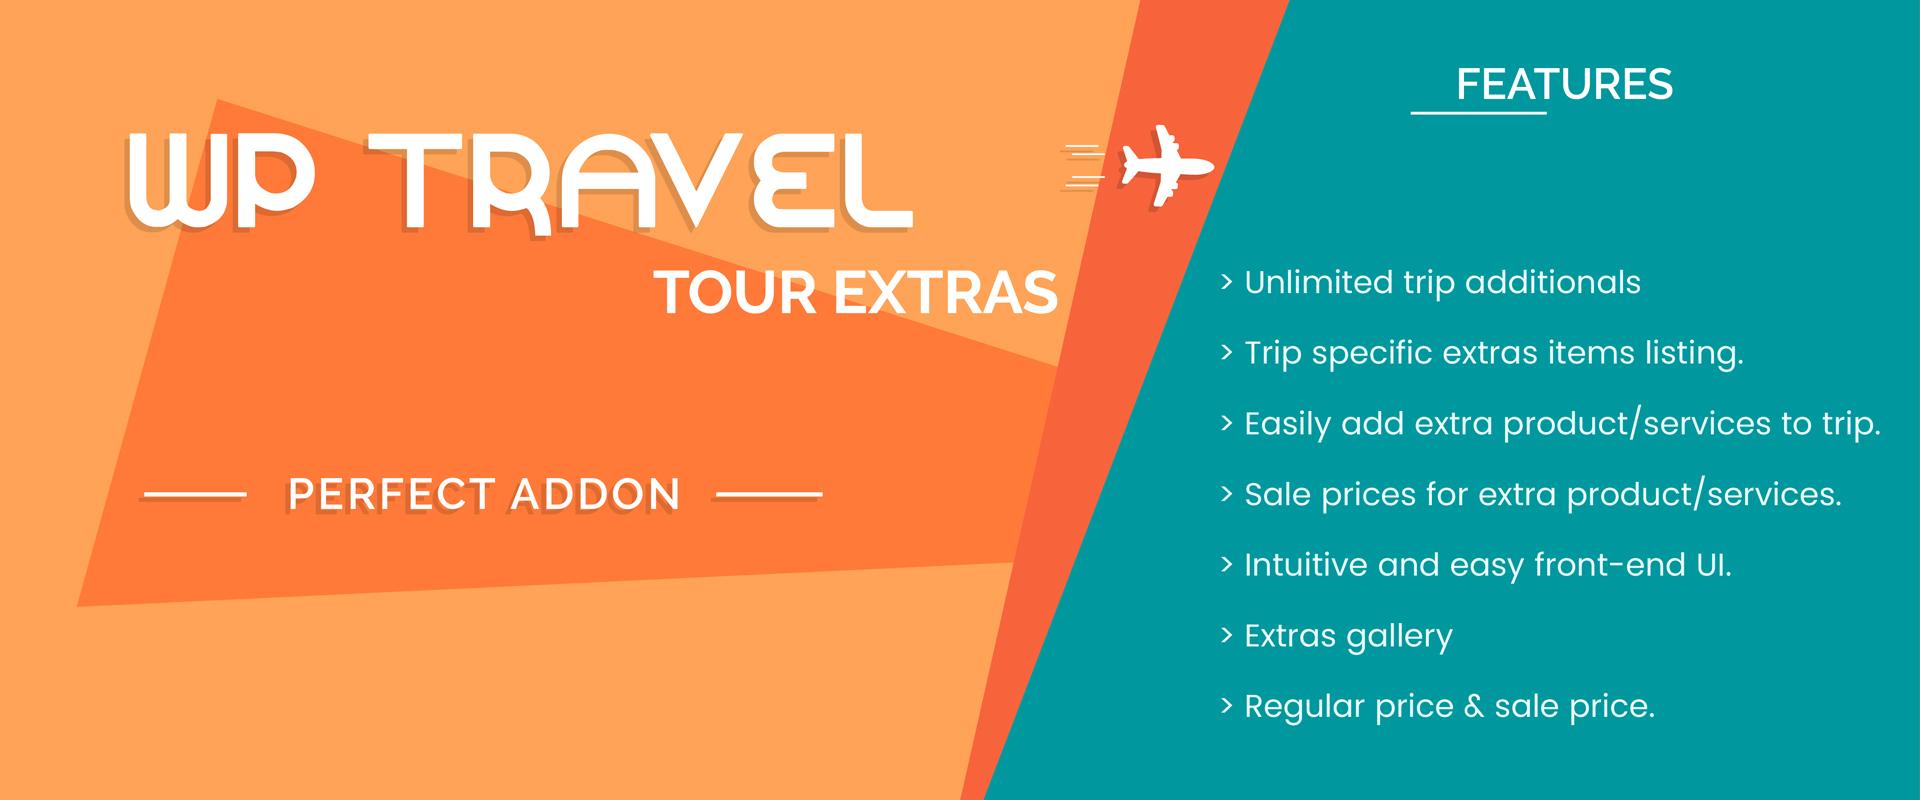 WP Travel Tour Extras